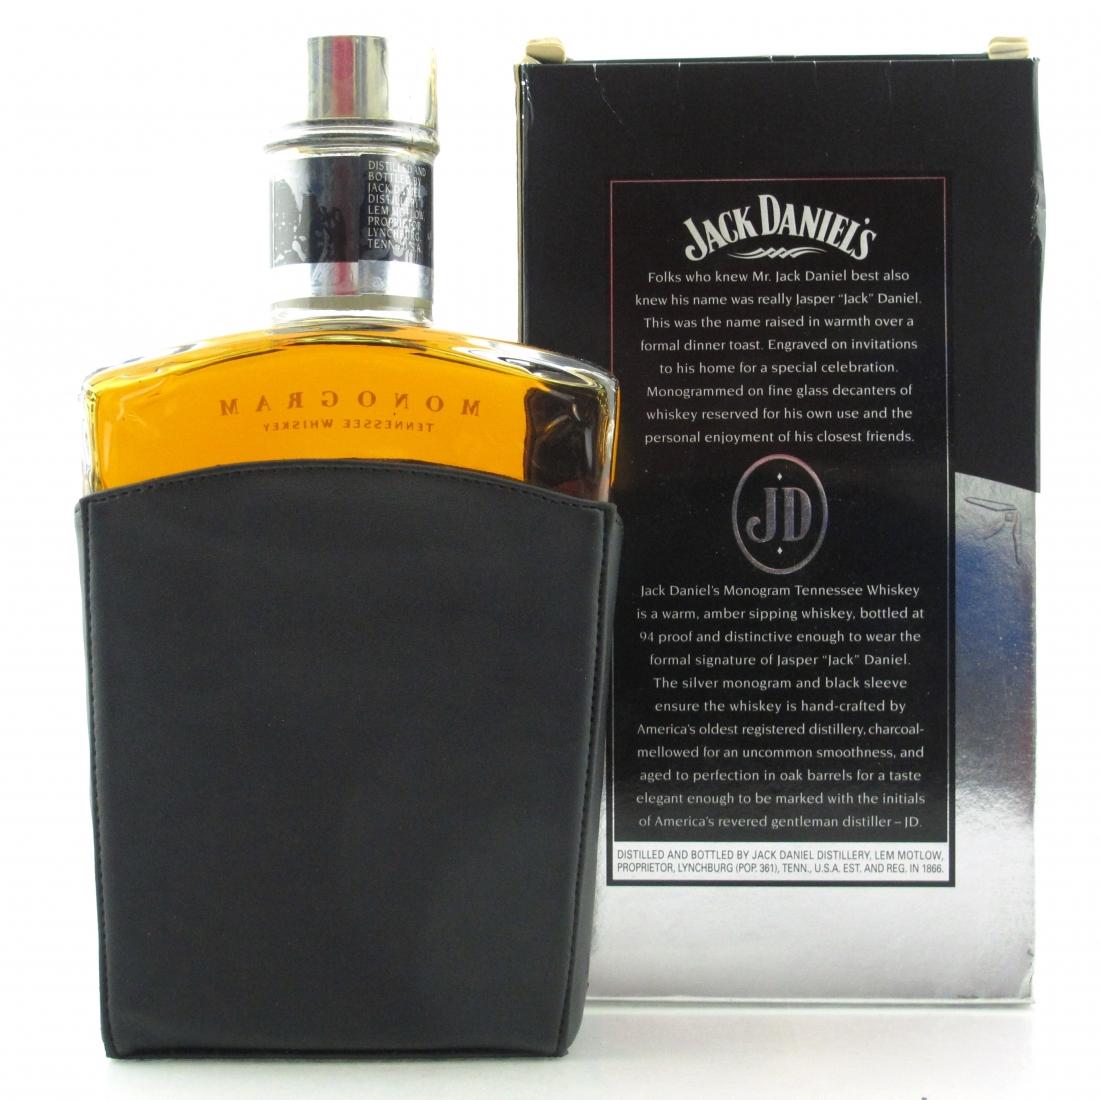 Jack Daniel's Monogram / 1998